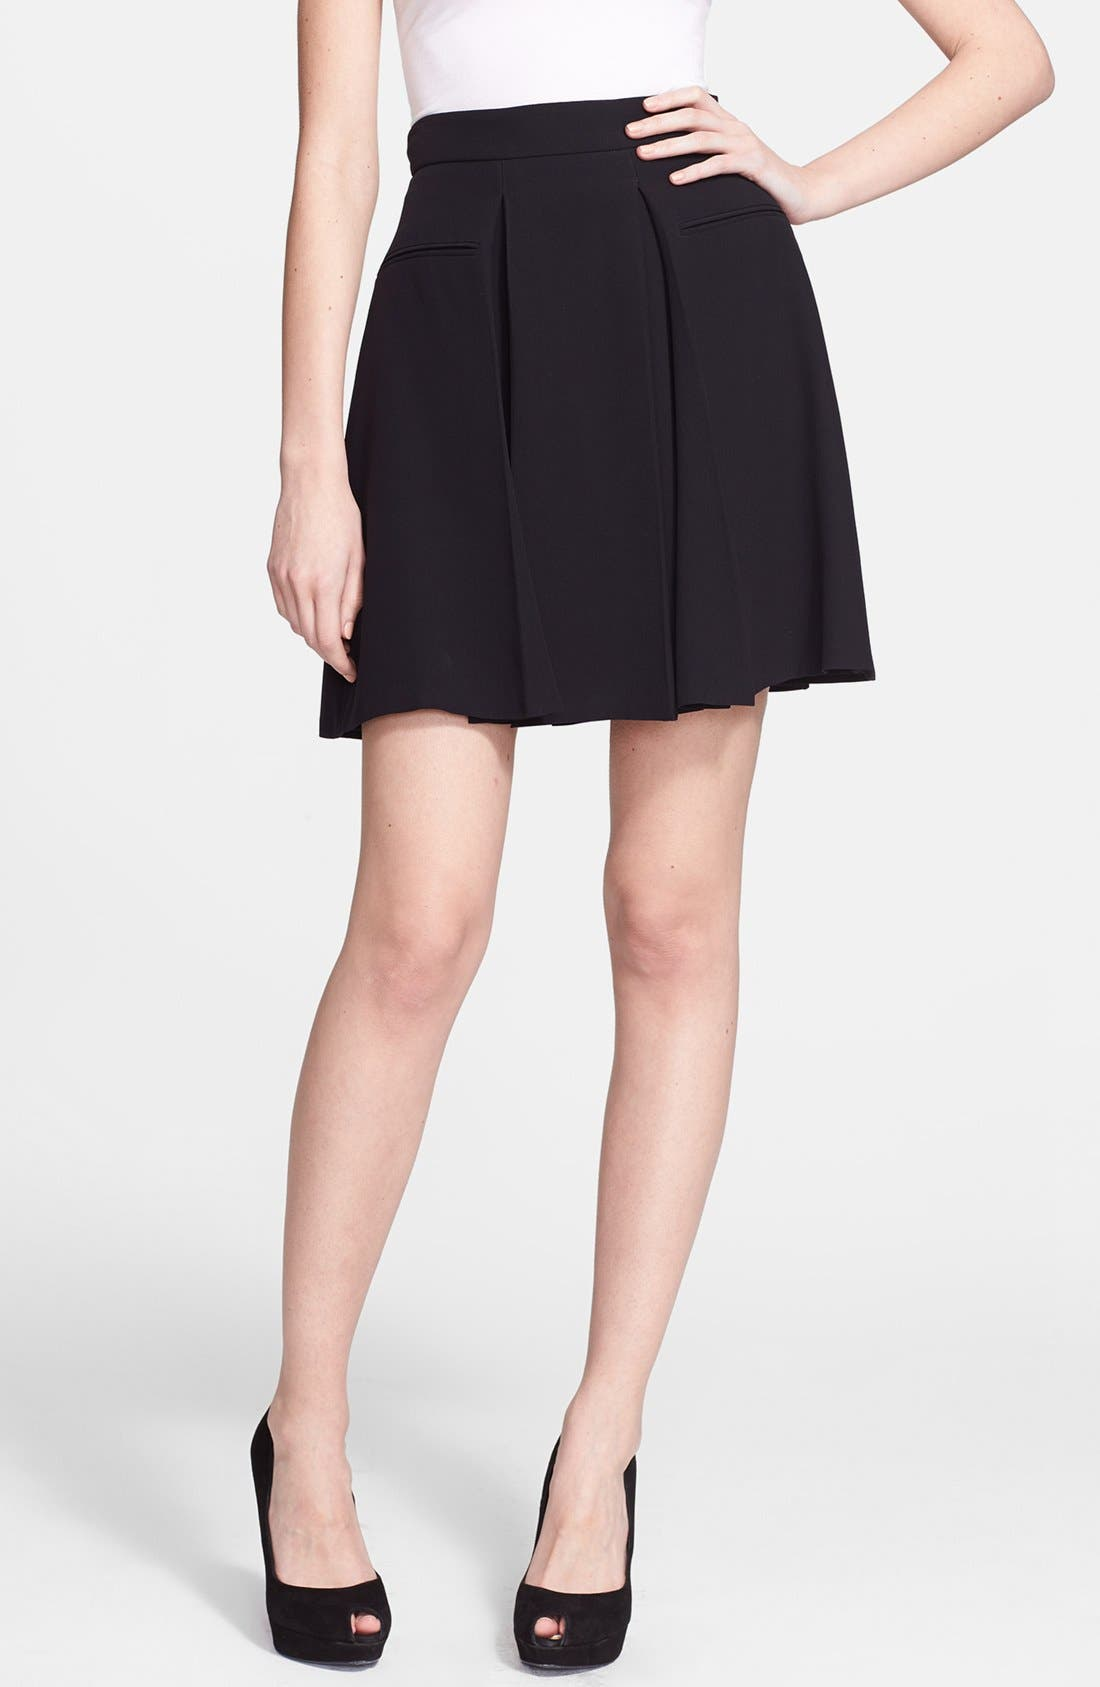 Alternate Image 1 Selected - Alexander McQueen Pleat Flared Skirt